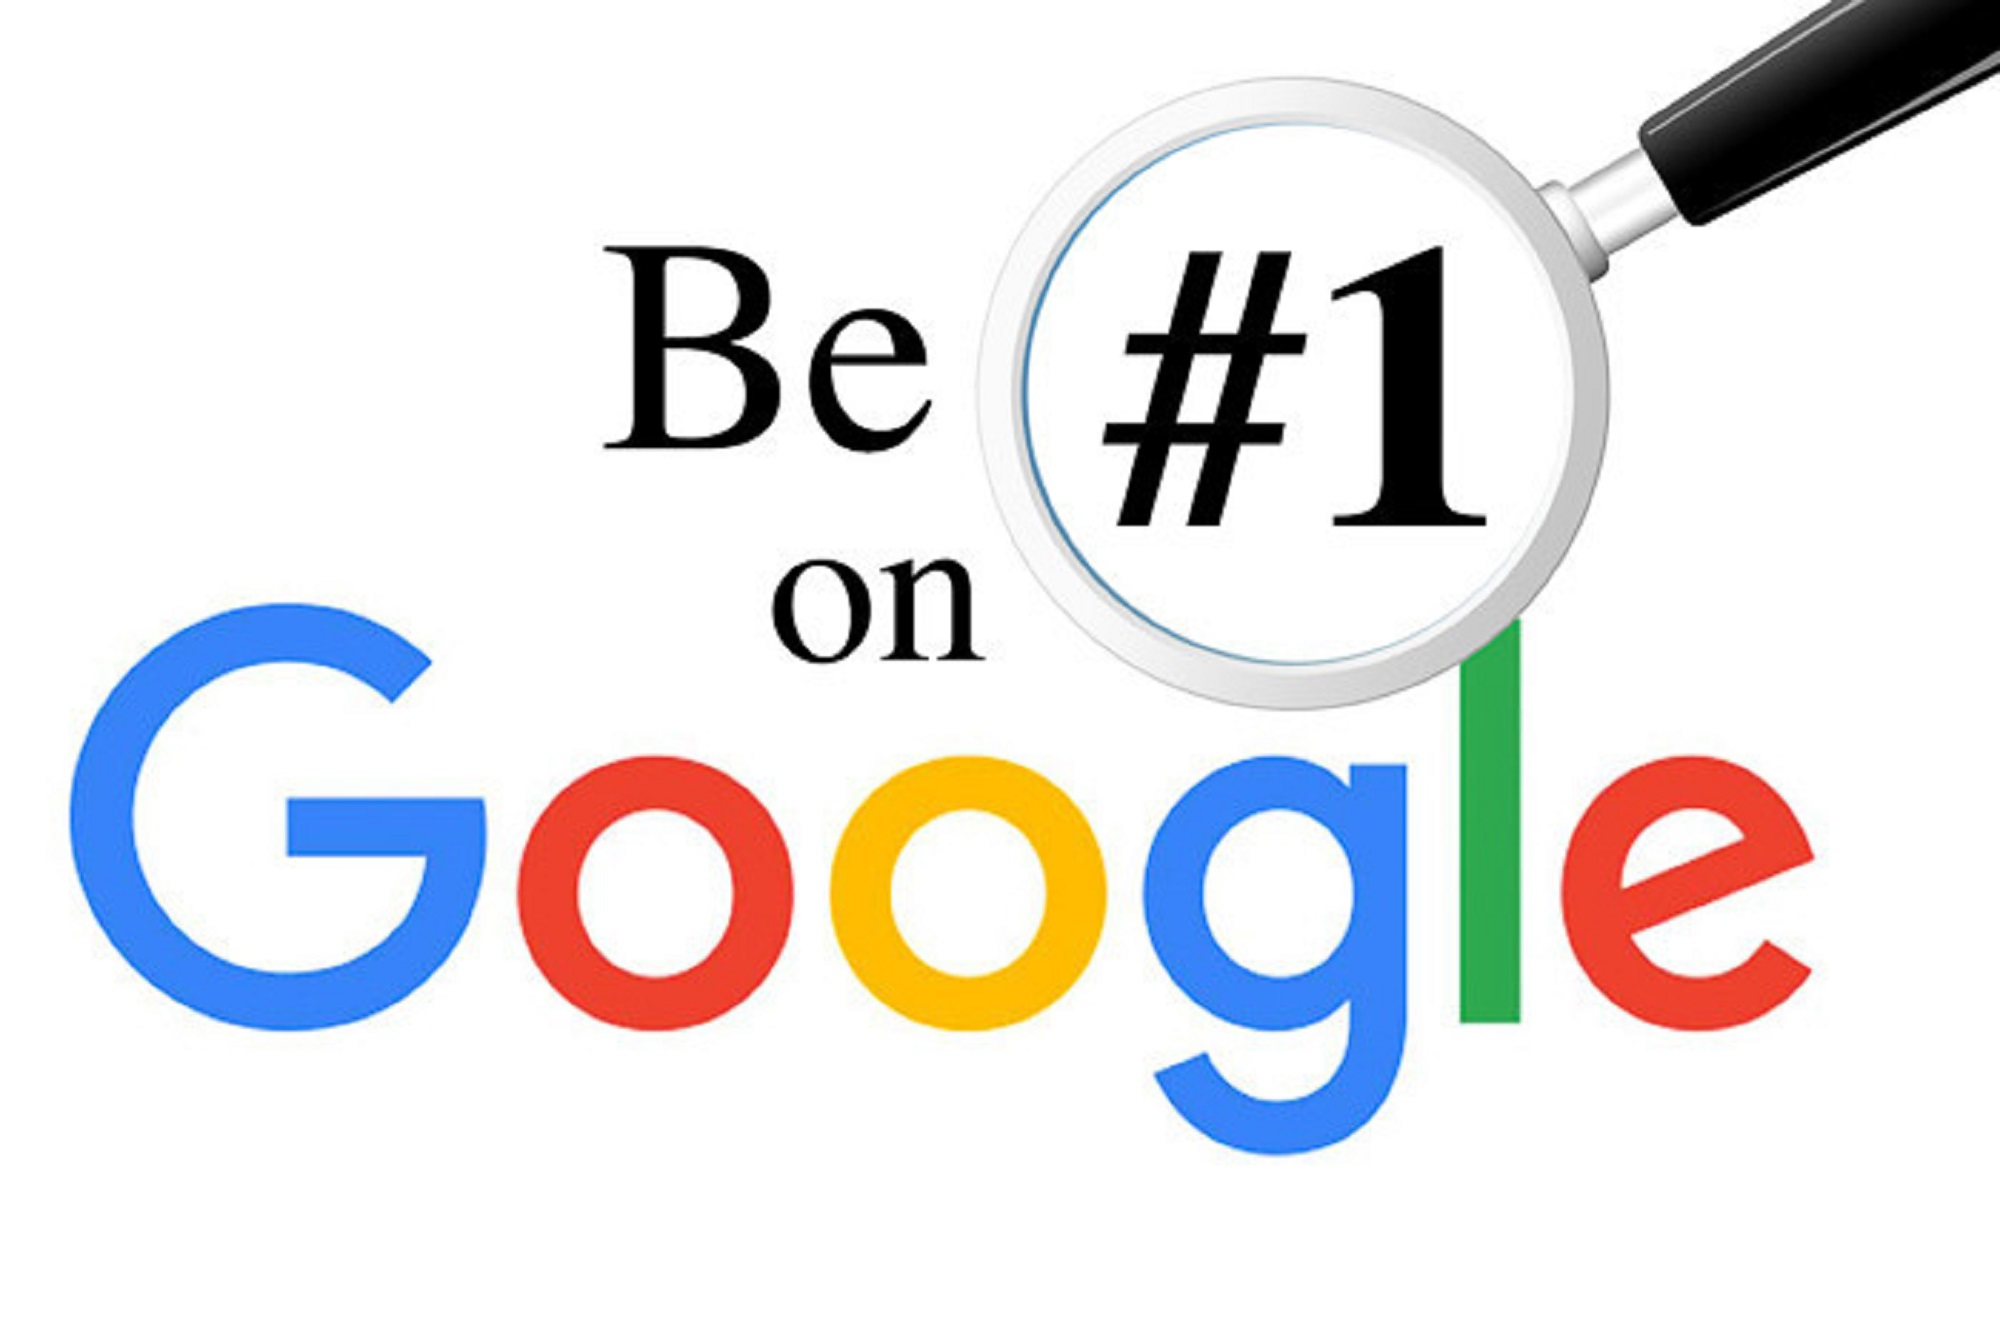 1000 high quality backlinks - rank 1 on Google